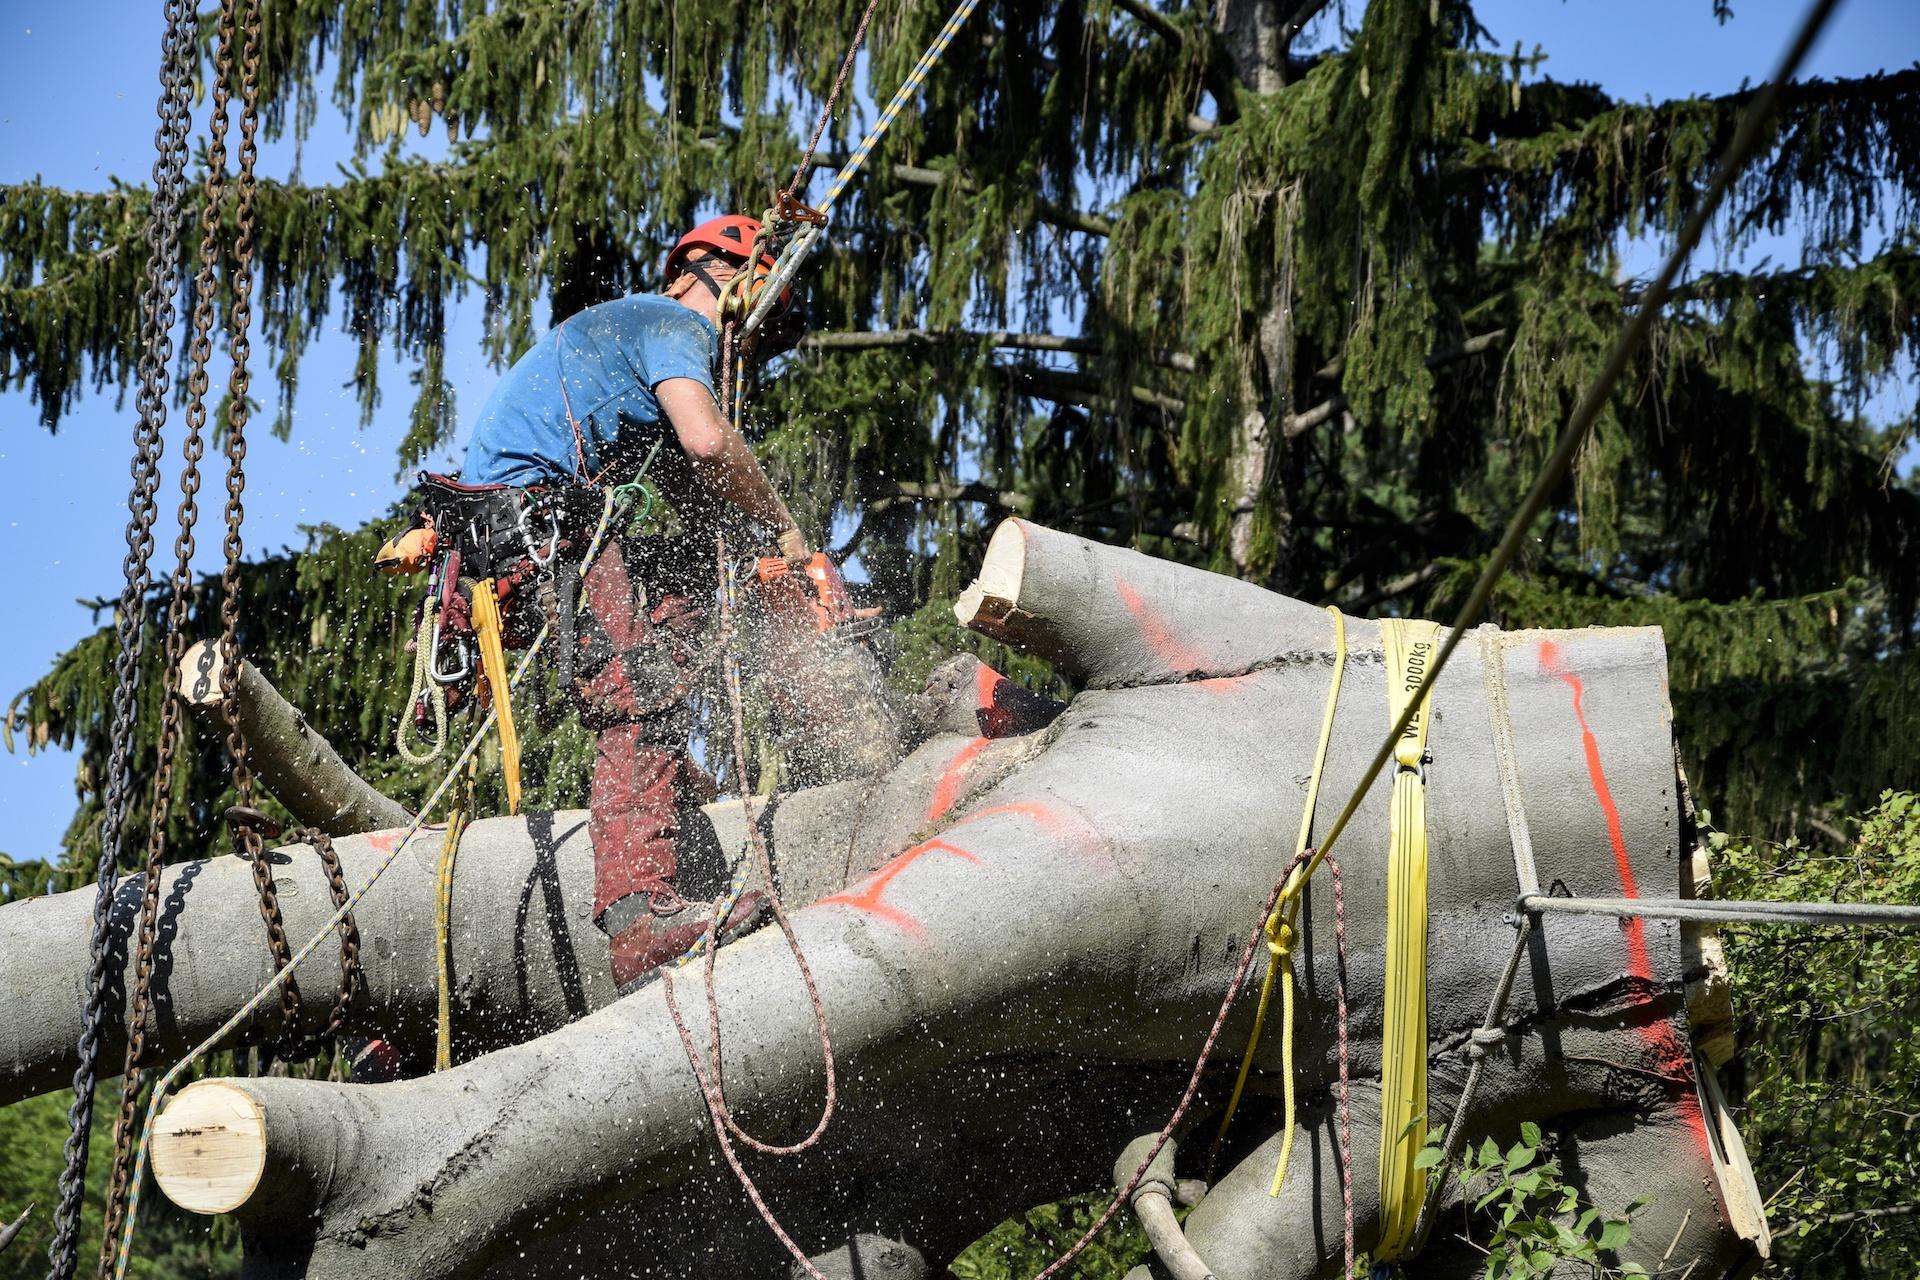 baumabtragung baumrodung großbaum klissenbauer